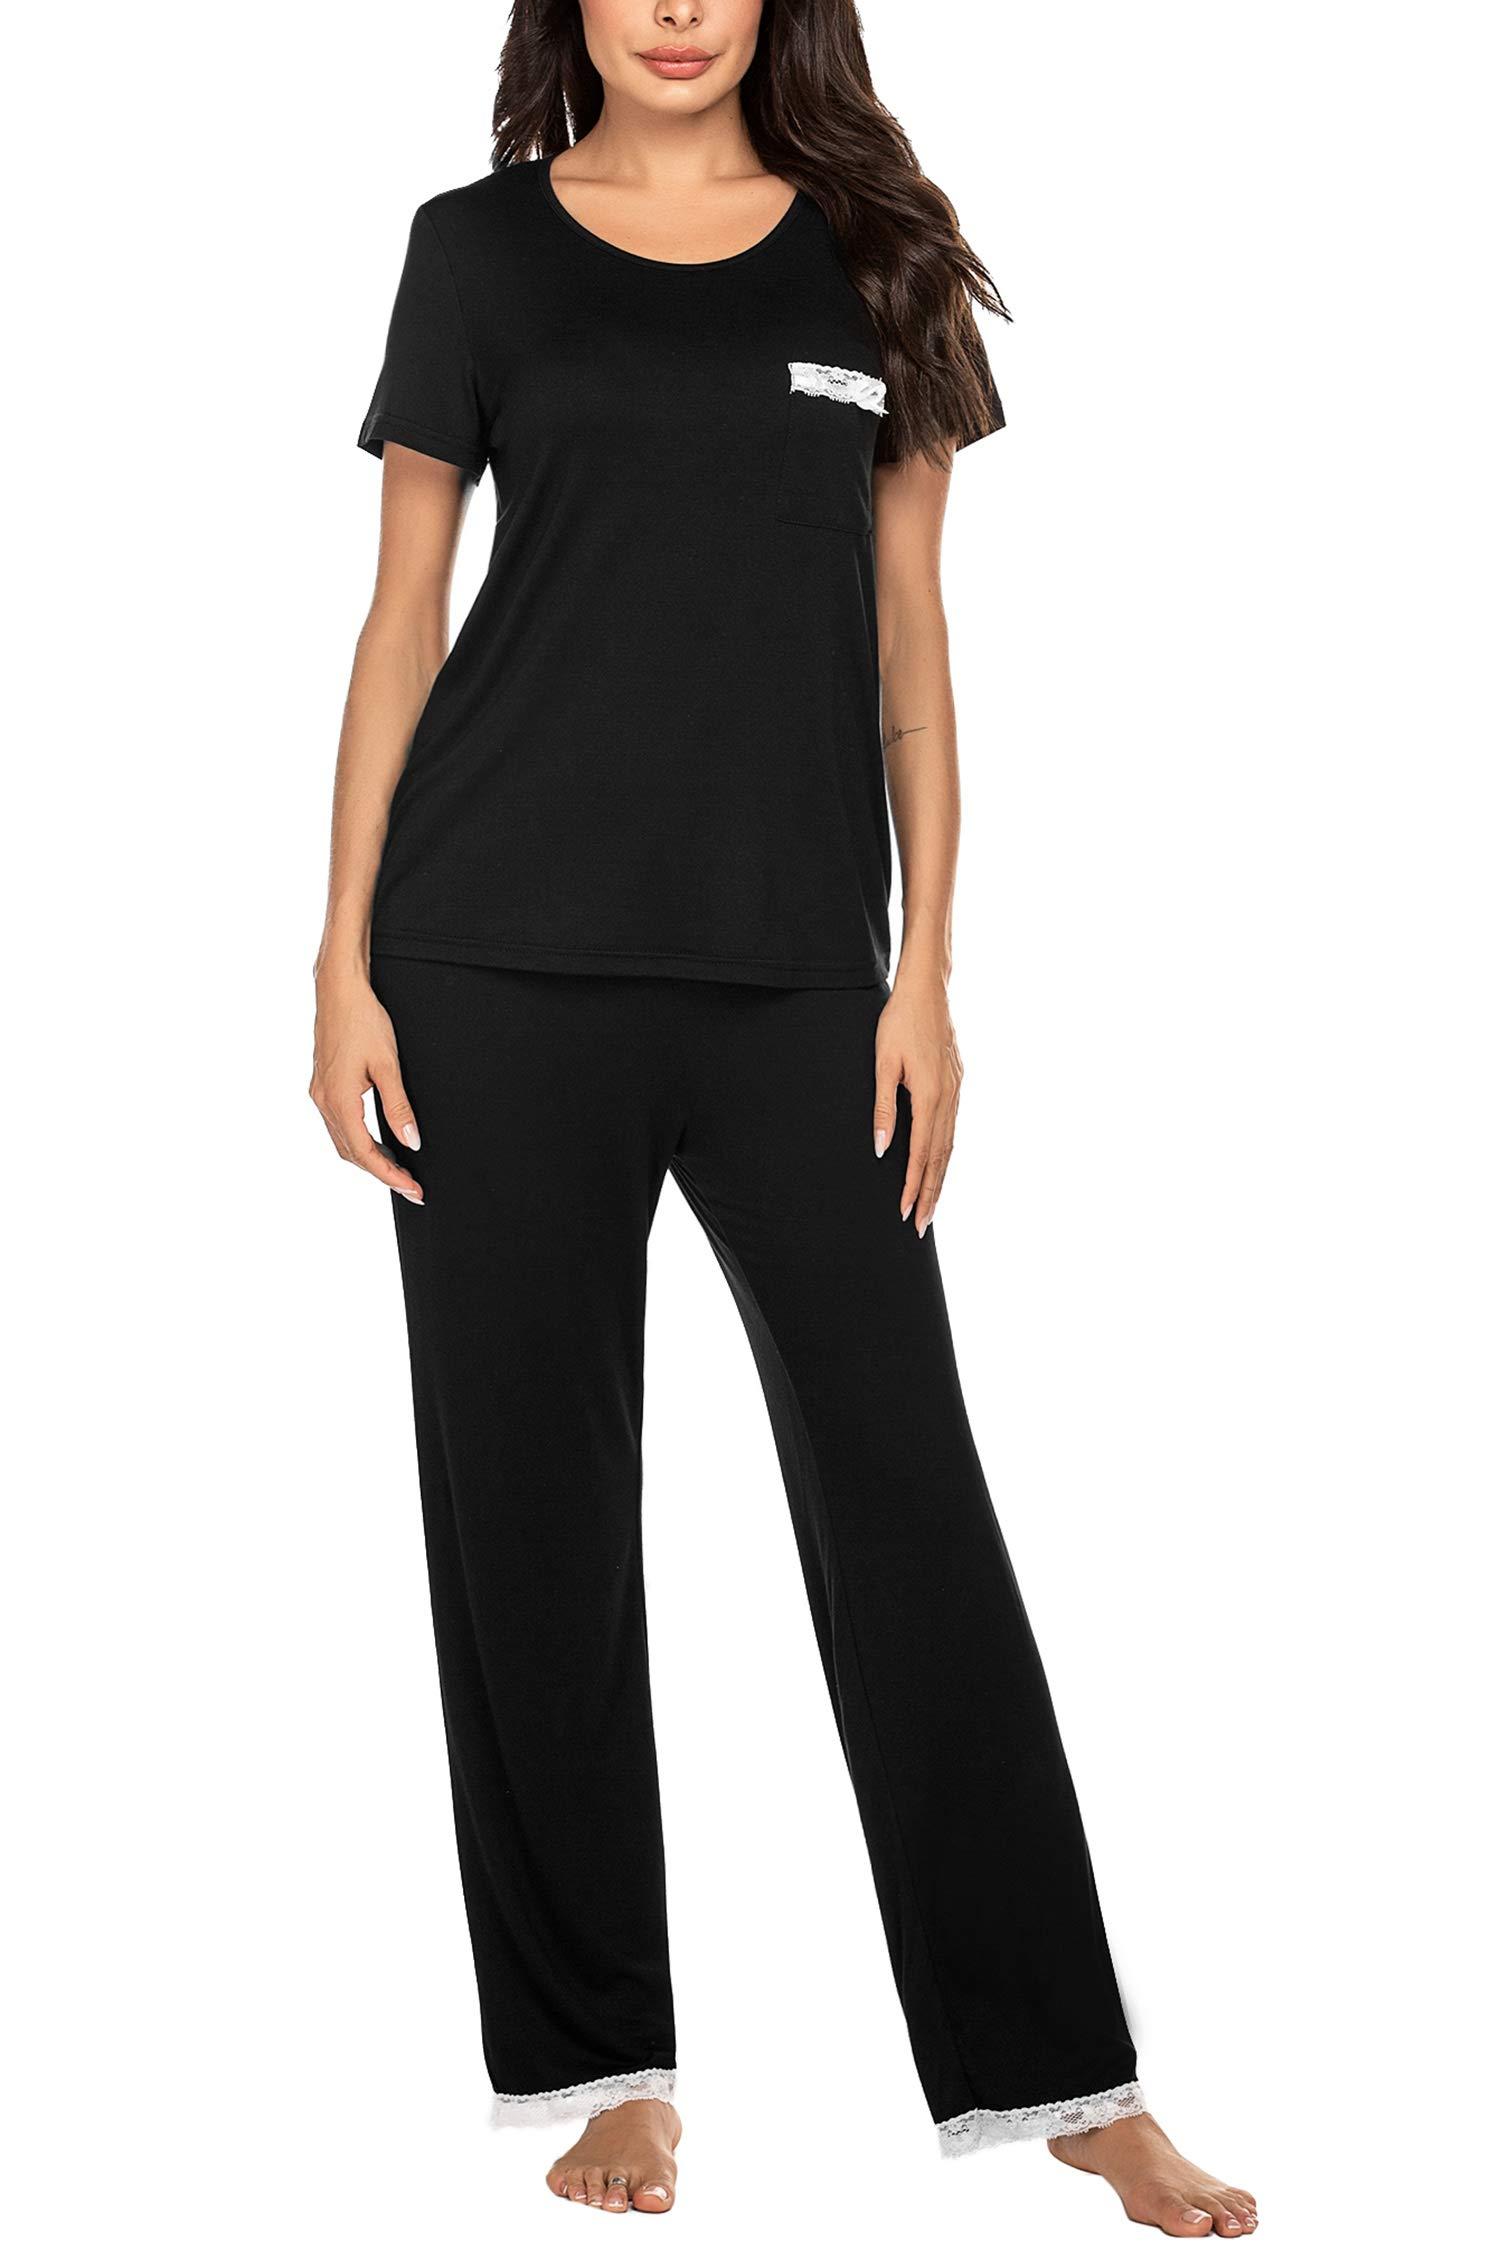 Ekouaer Womens Pajama Set Lace Back Short Sleeve Top & Pants Sleepwear Pjs Sets S-XXL